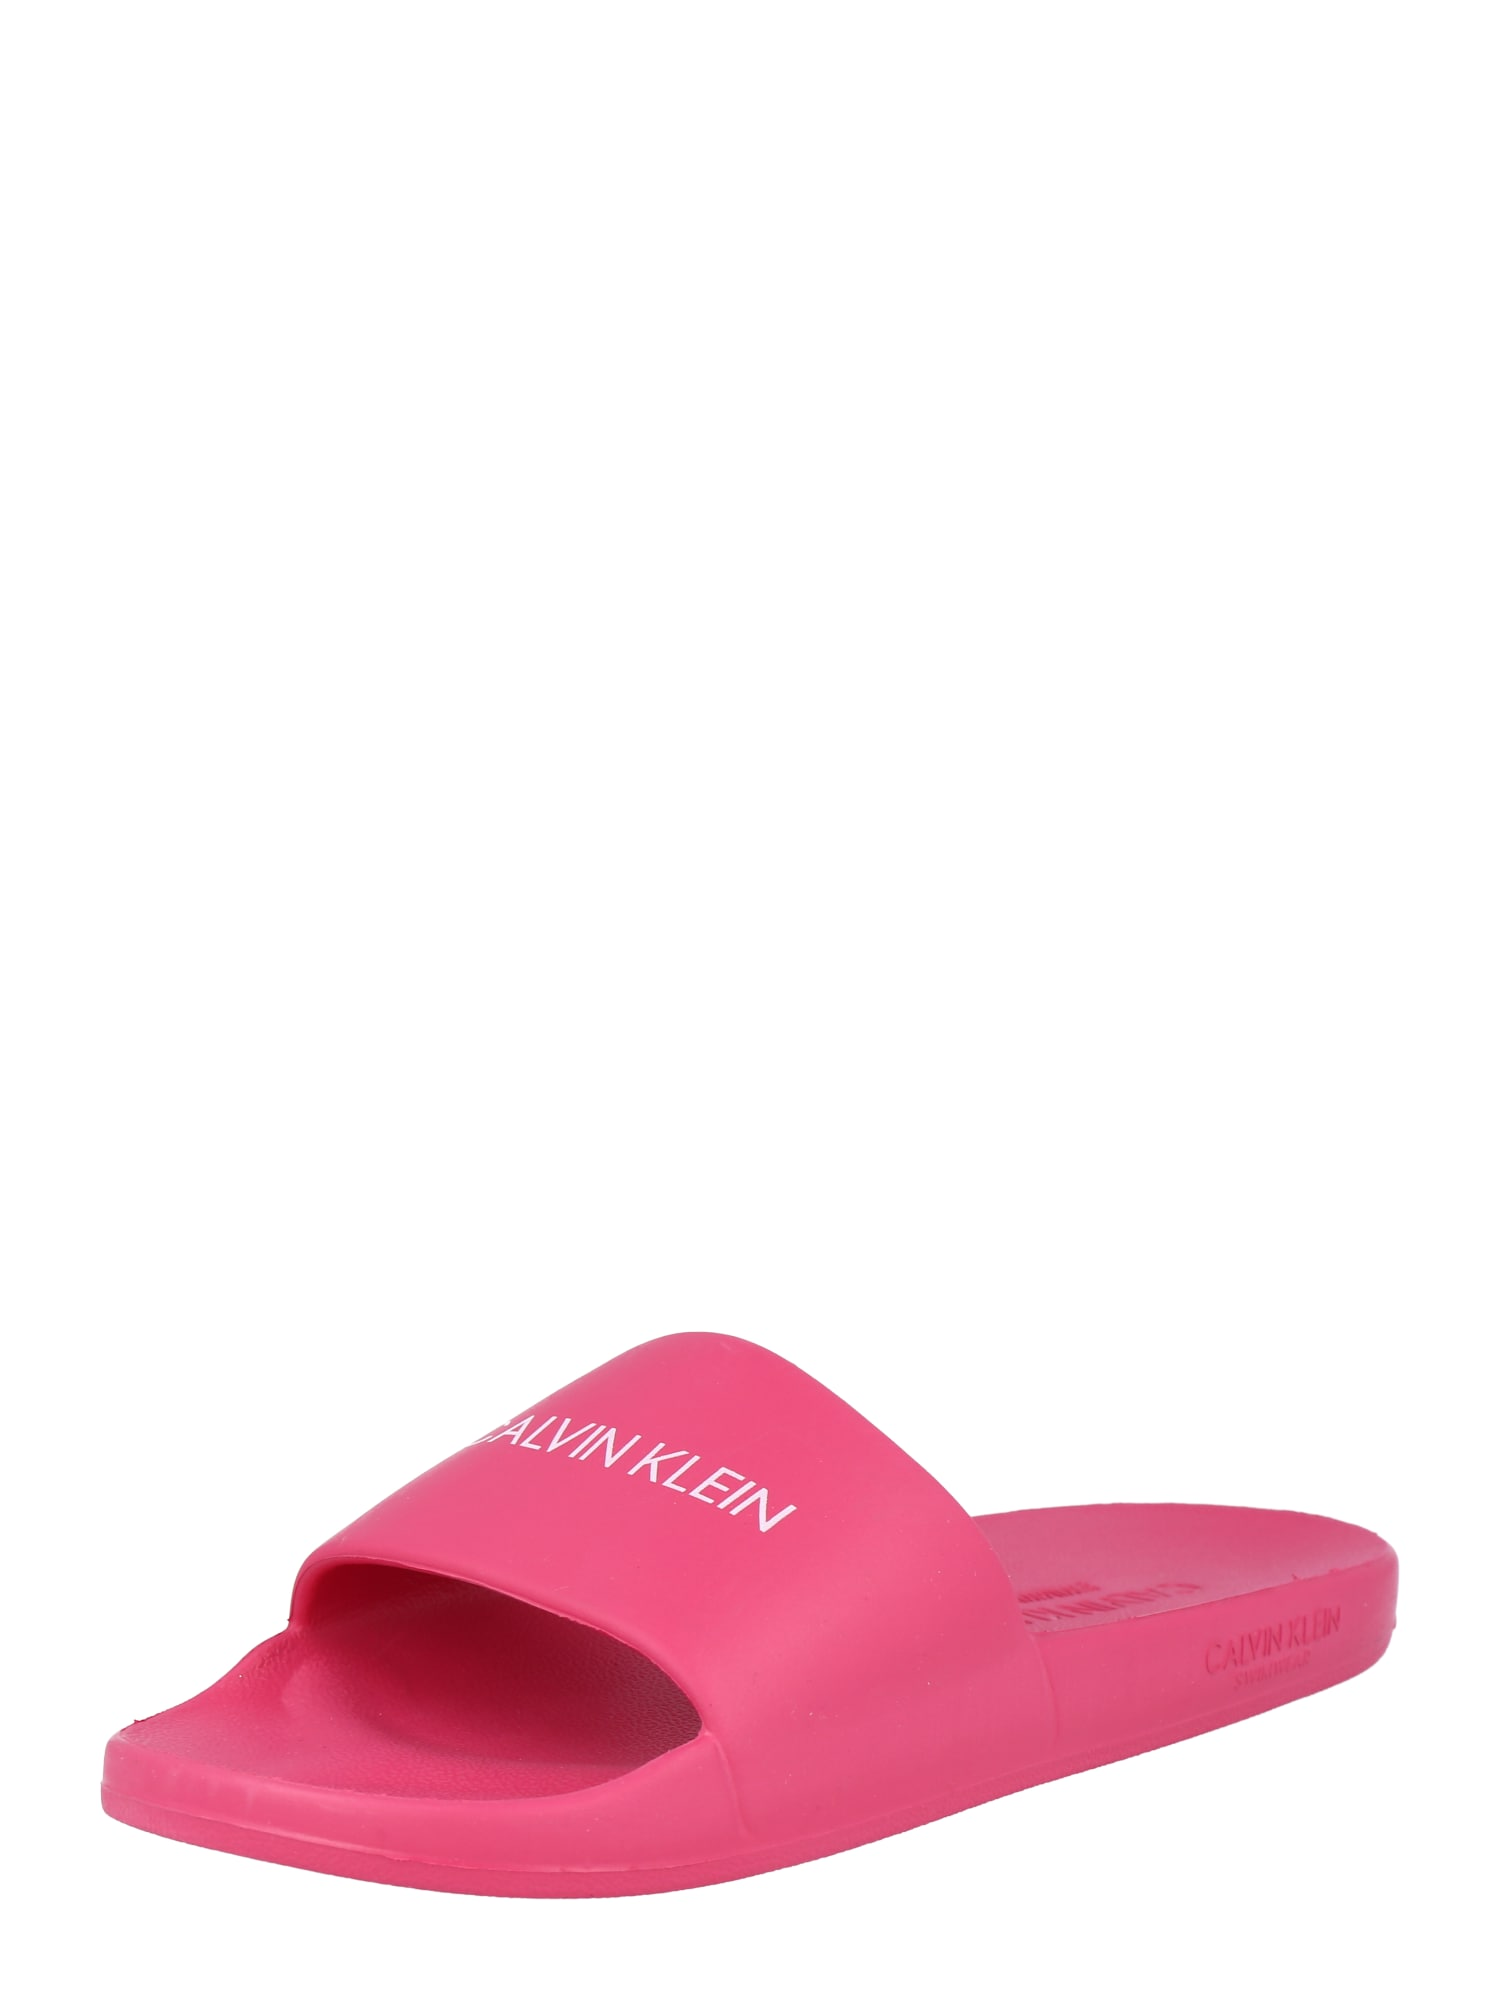 Calvin Klein Swimwear Atviri batai 'ONE MOLD SLIDE' rožinė / balta